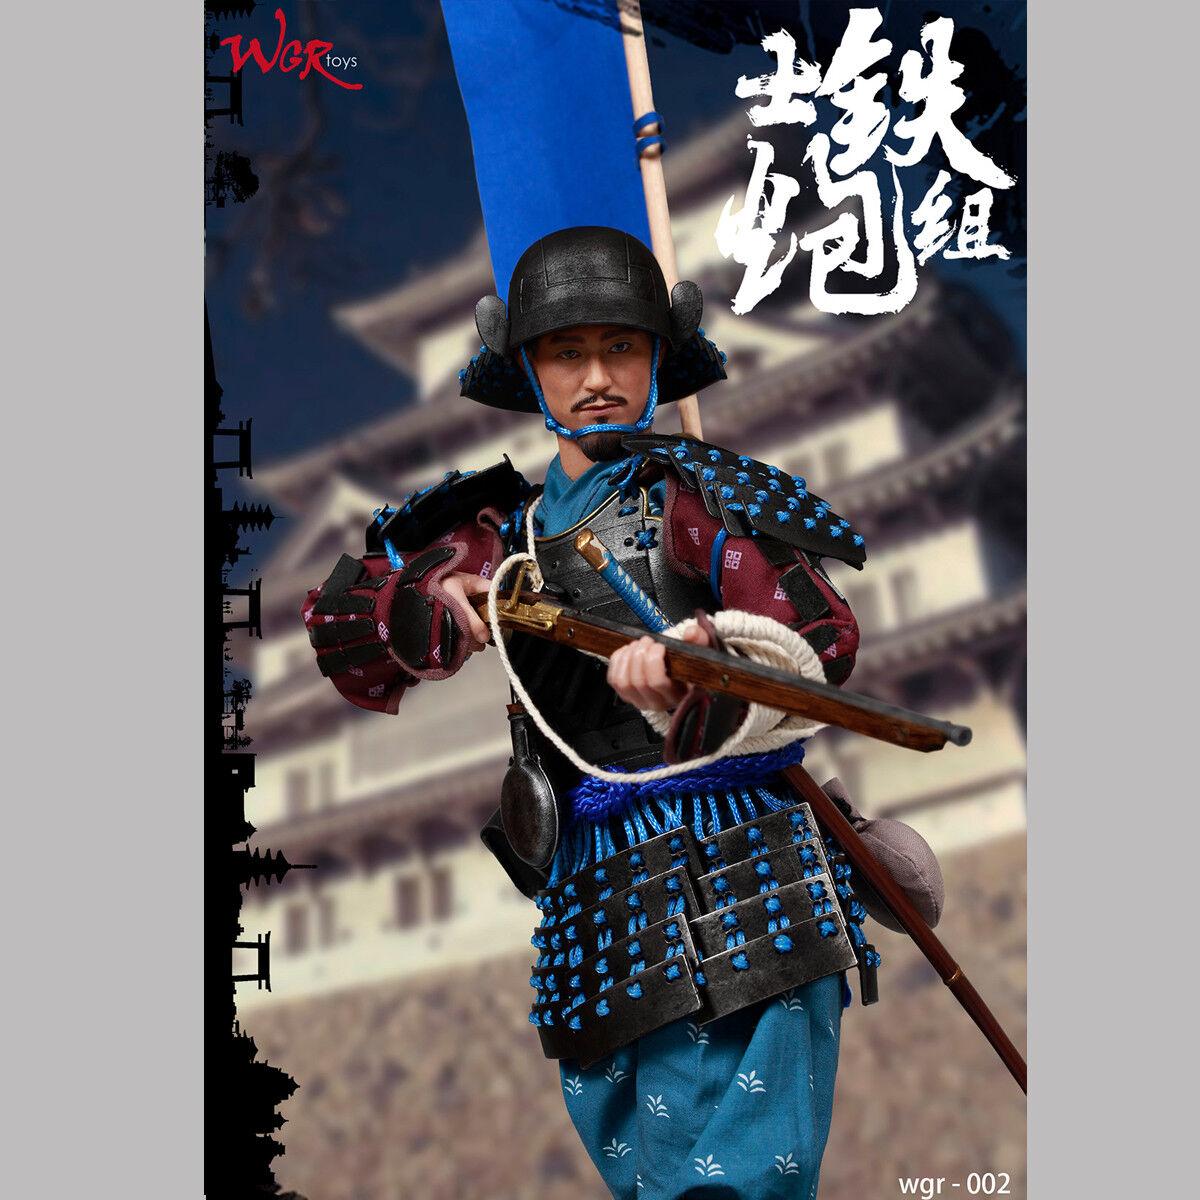 WGRtoys 002 1 6th Samurai artilleur Group Captain Combat Action Figure de Collection